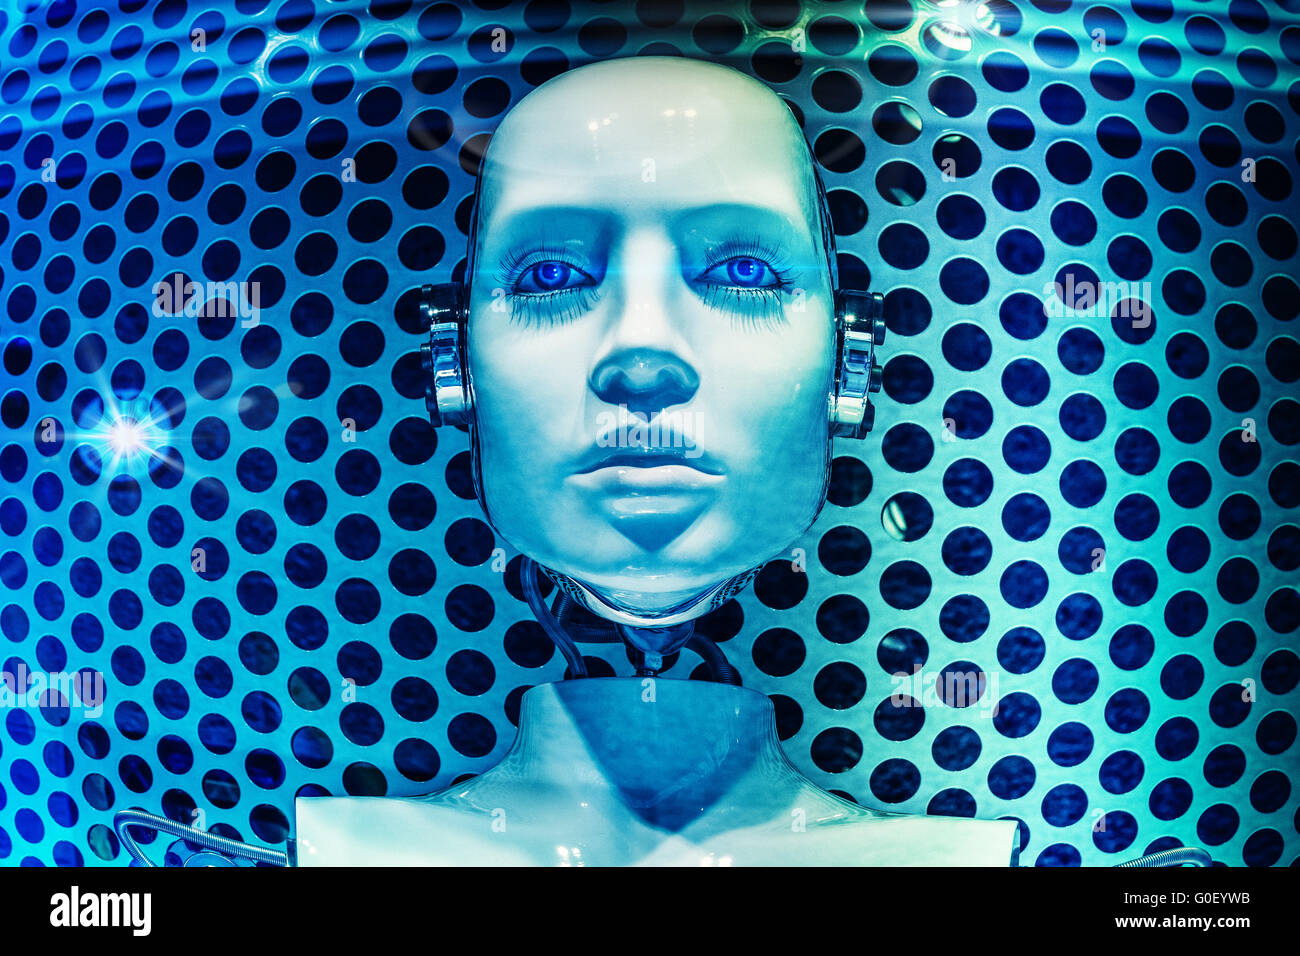 Robot Immagini Stock